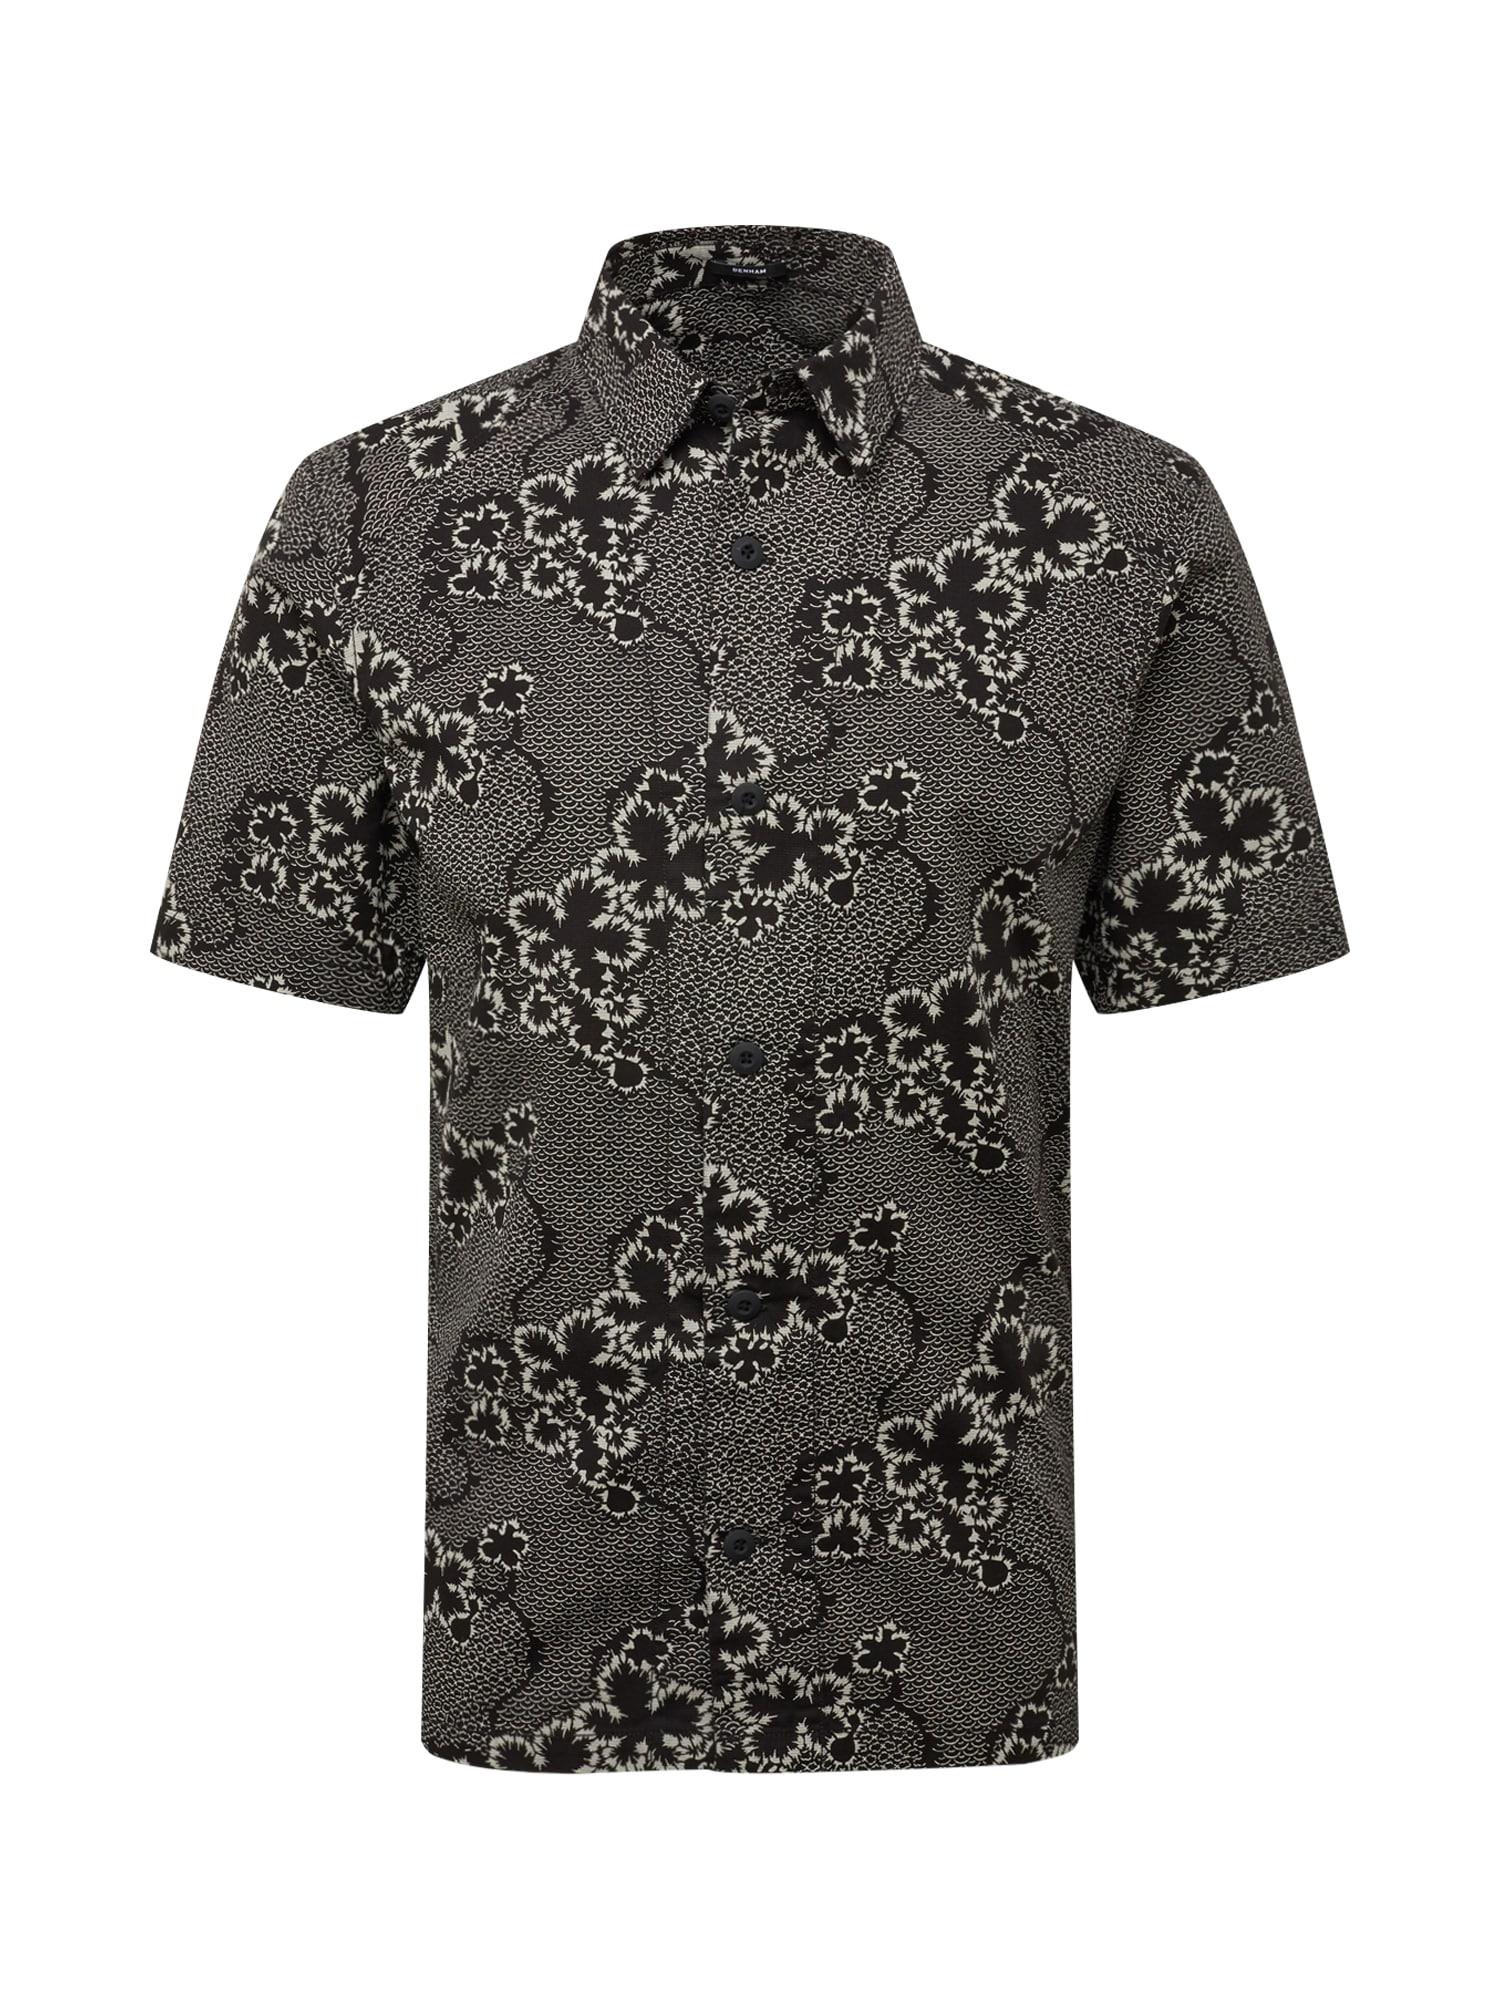 Košile SHERMAN tmavě šedá černá DENHAM